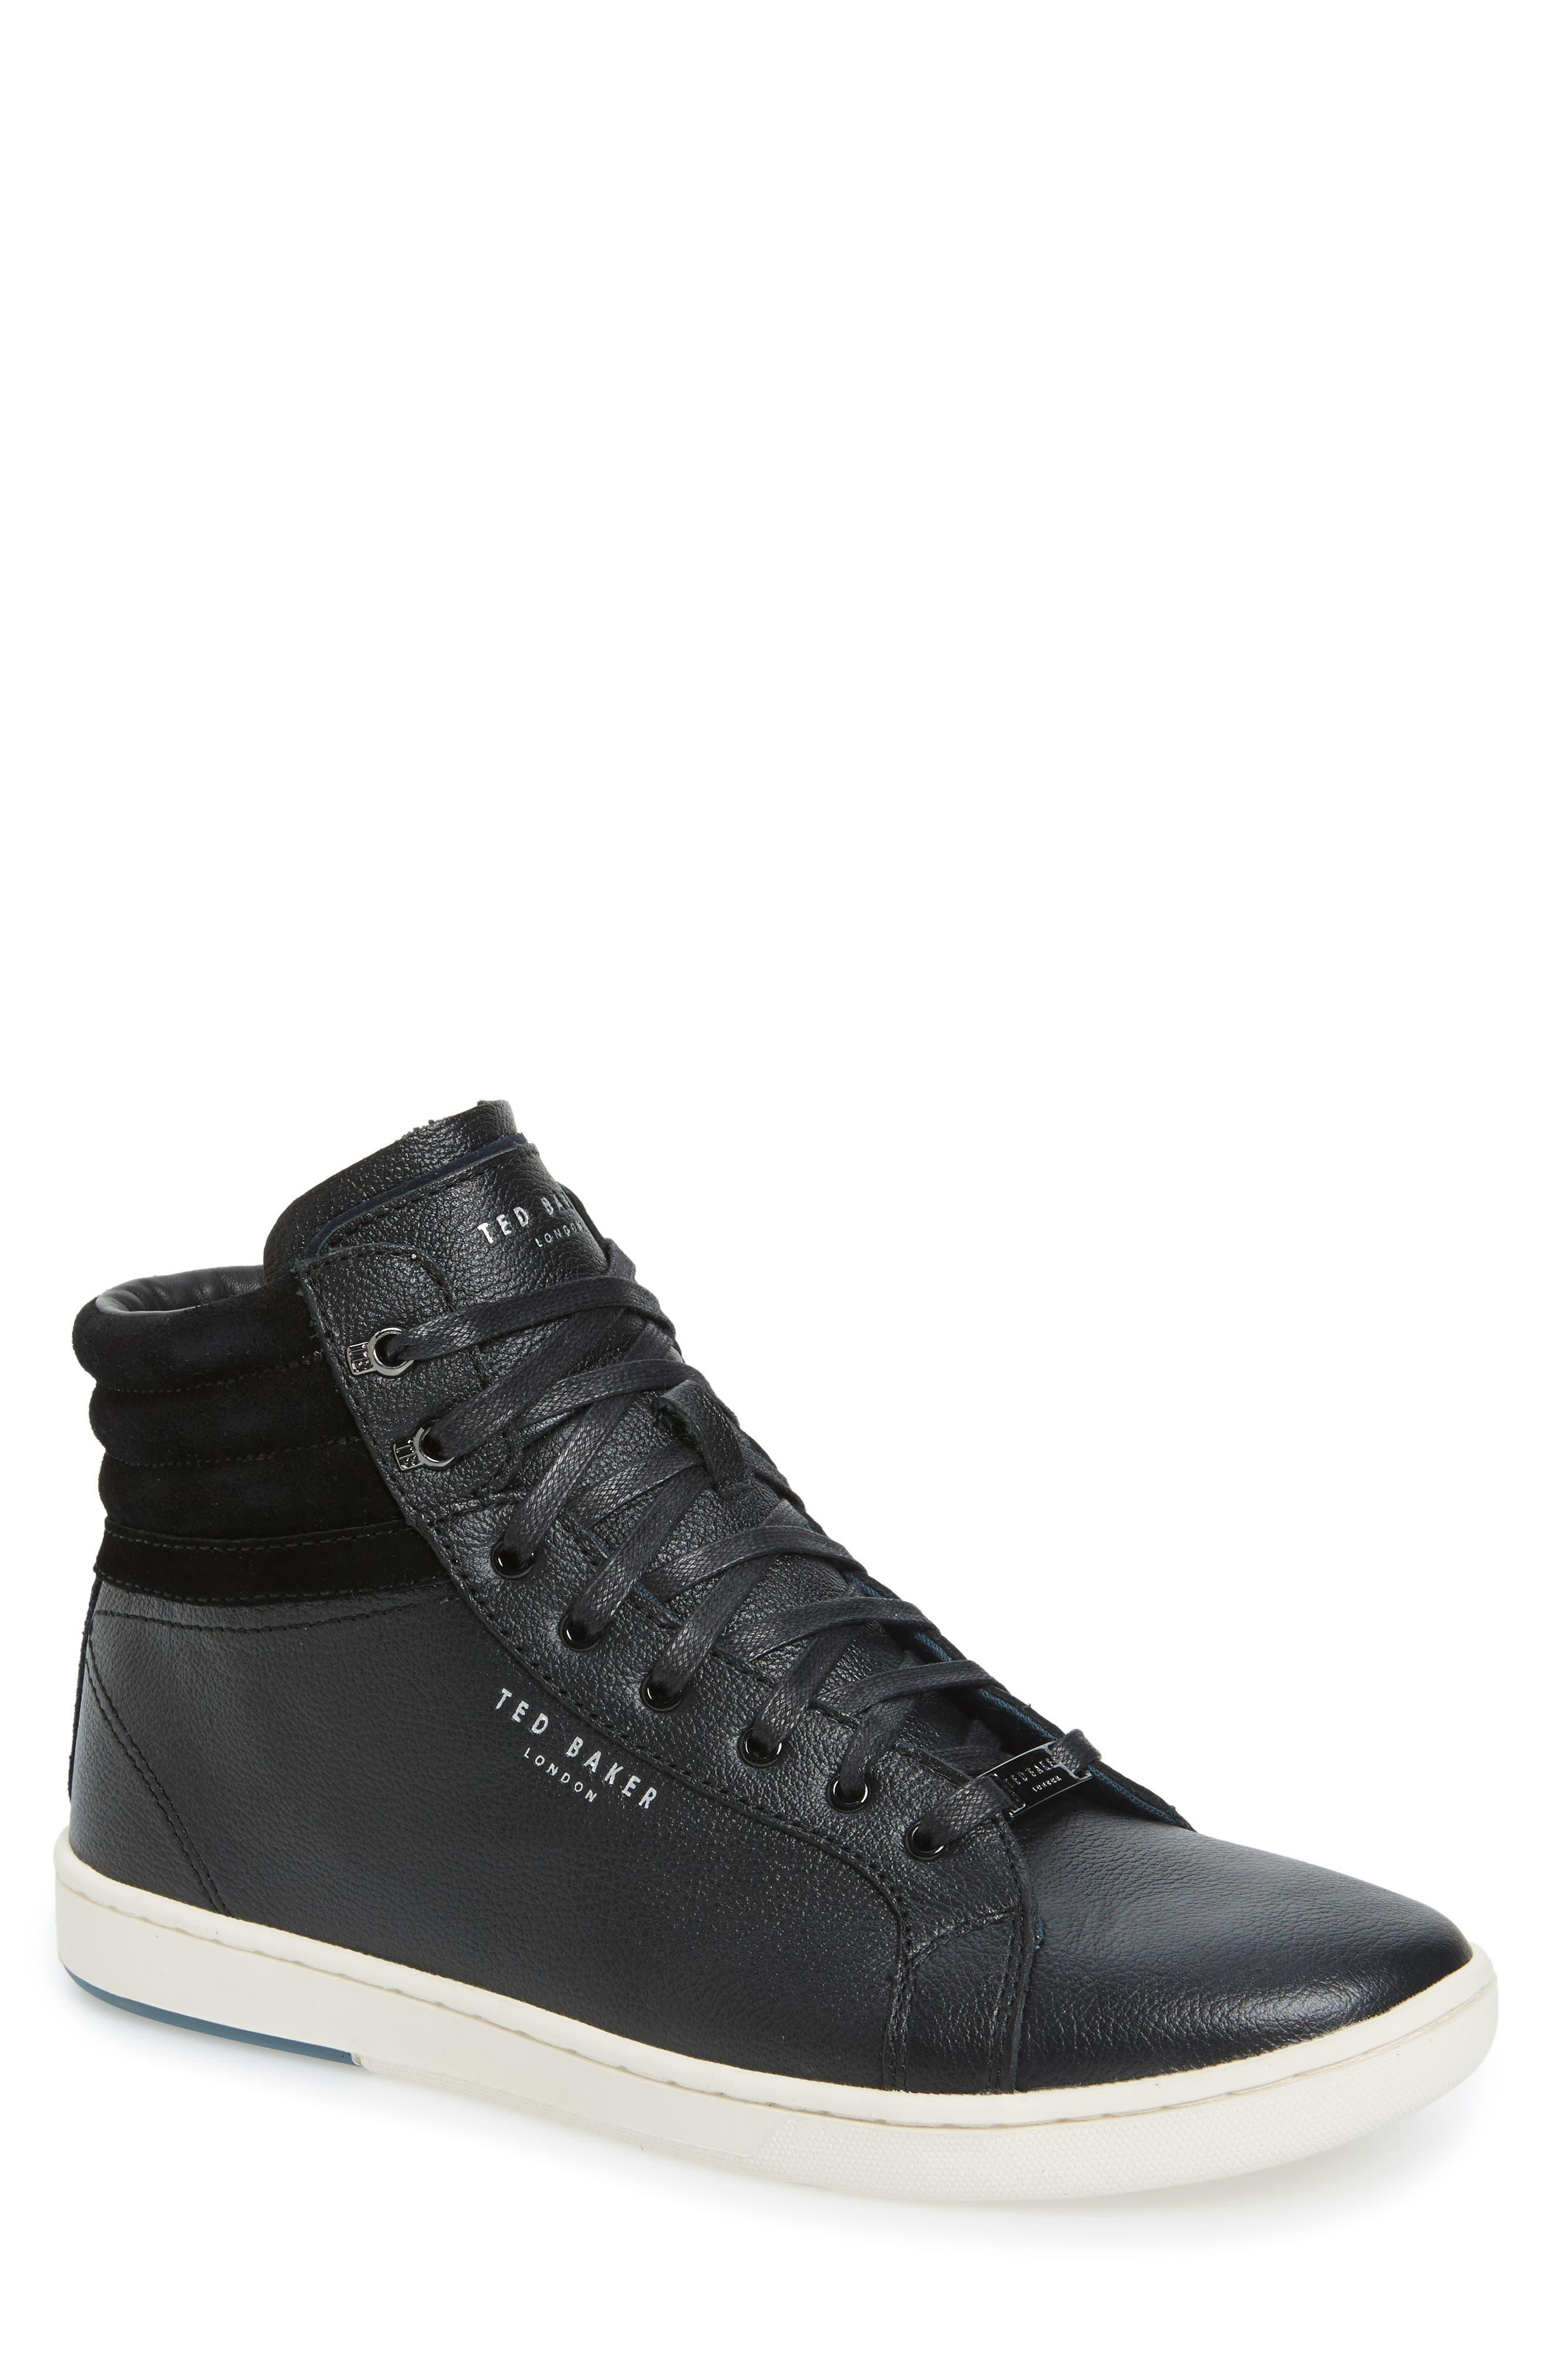 Mykka Sneaker,                             Main thumbnail 1, color,                             Black Leather